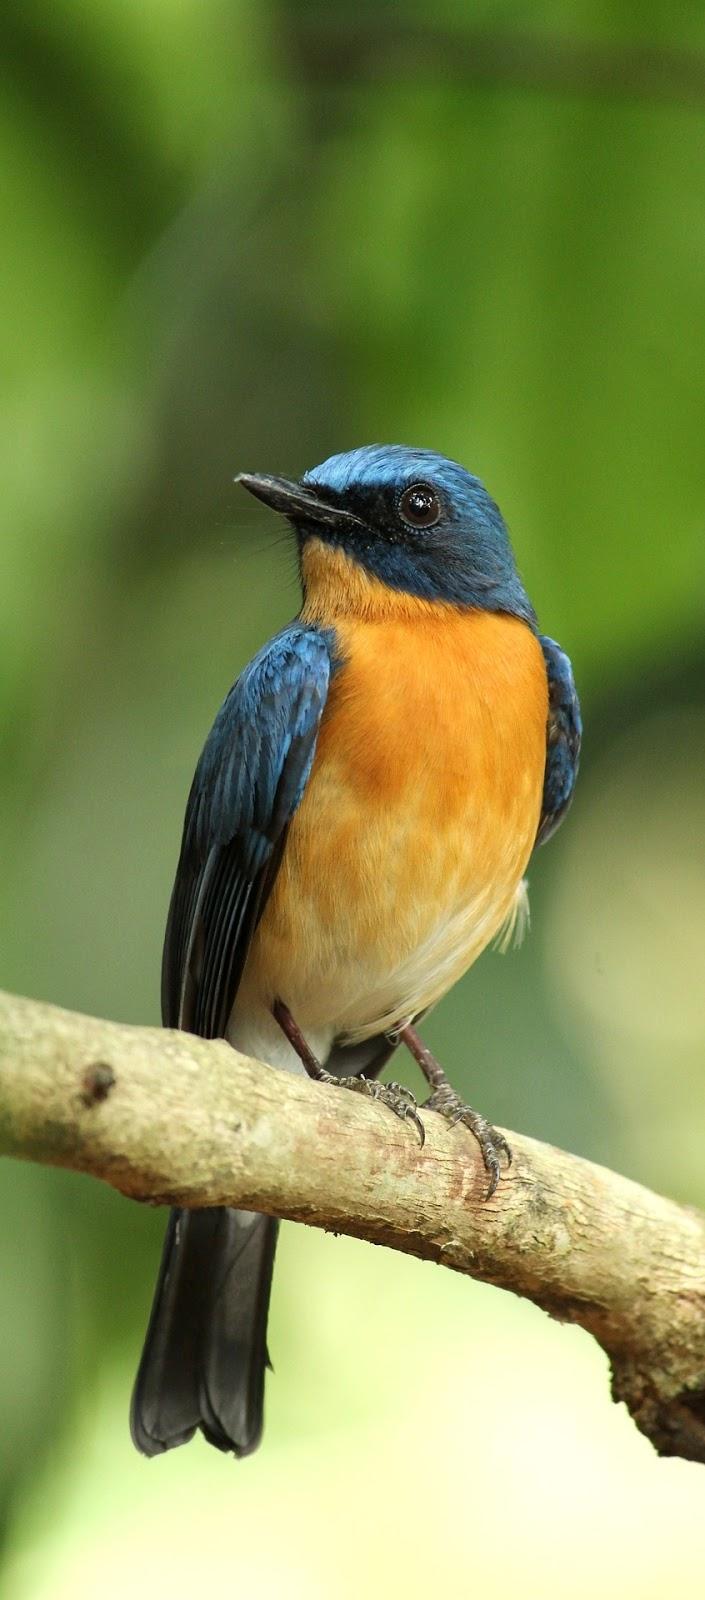 A beautiful bird.